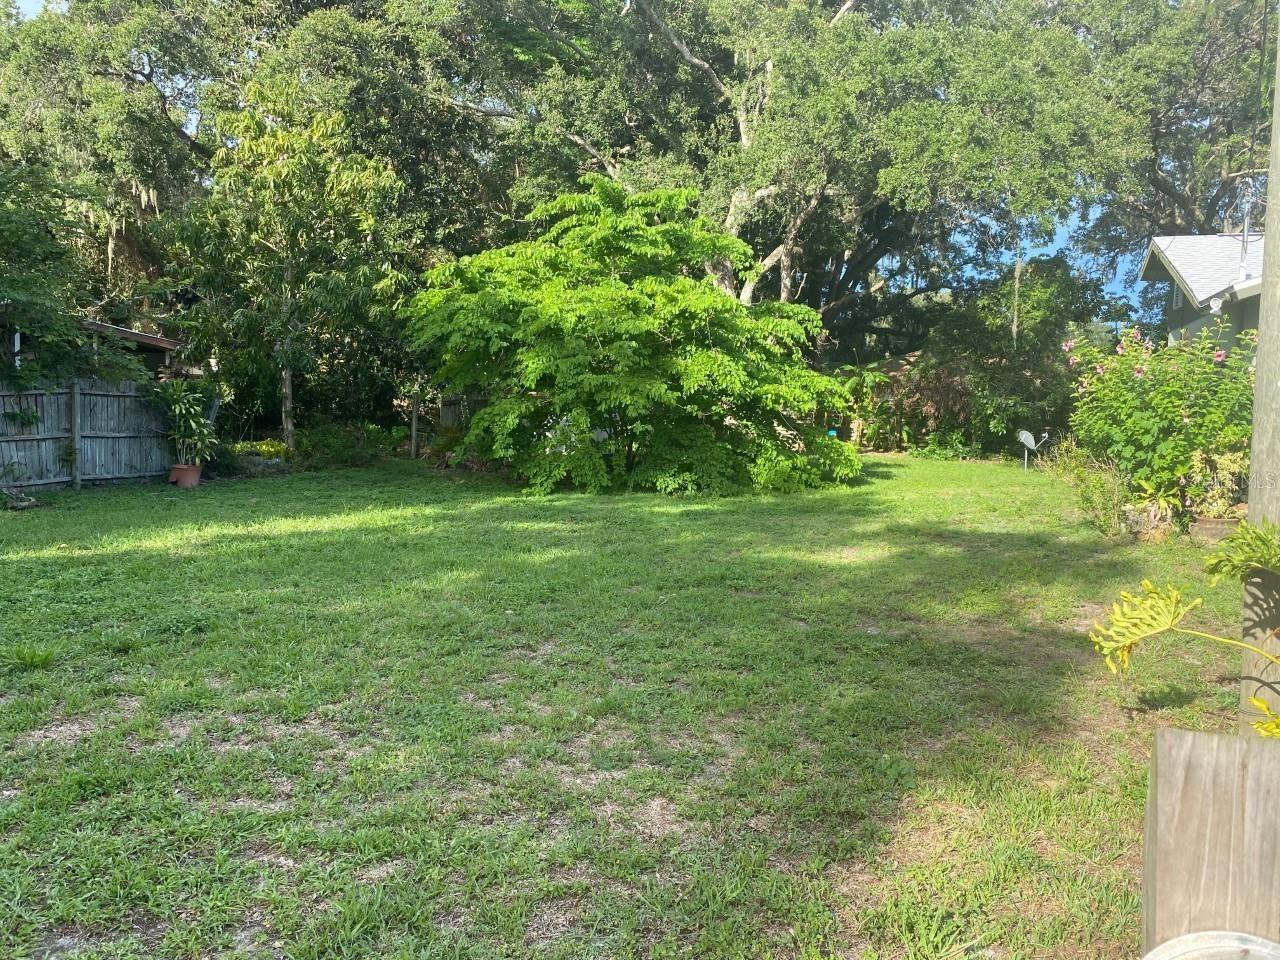 Photo of GALLUP AVENUE, SARASOTA, FL 34233 (MLS # N6116307)